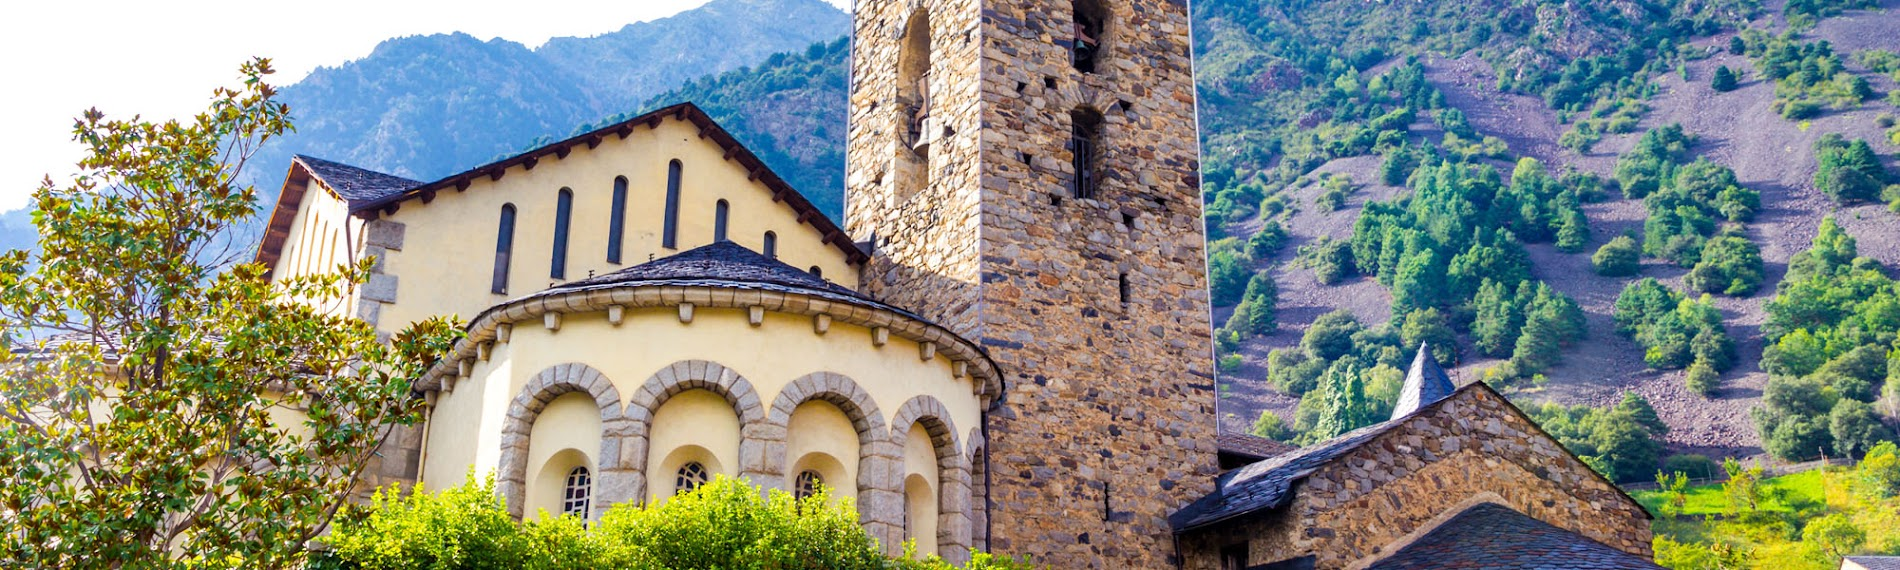 Holidays in Andorra